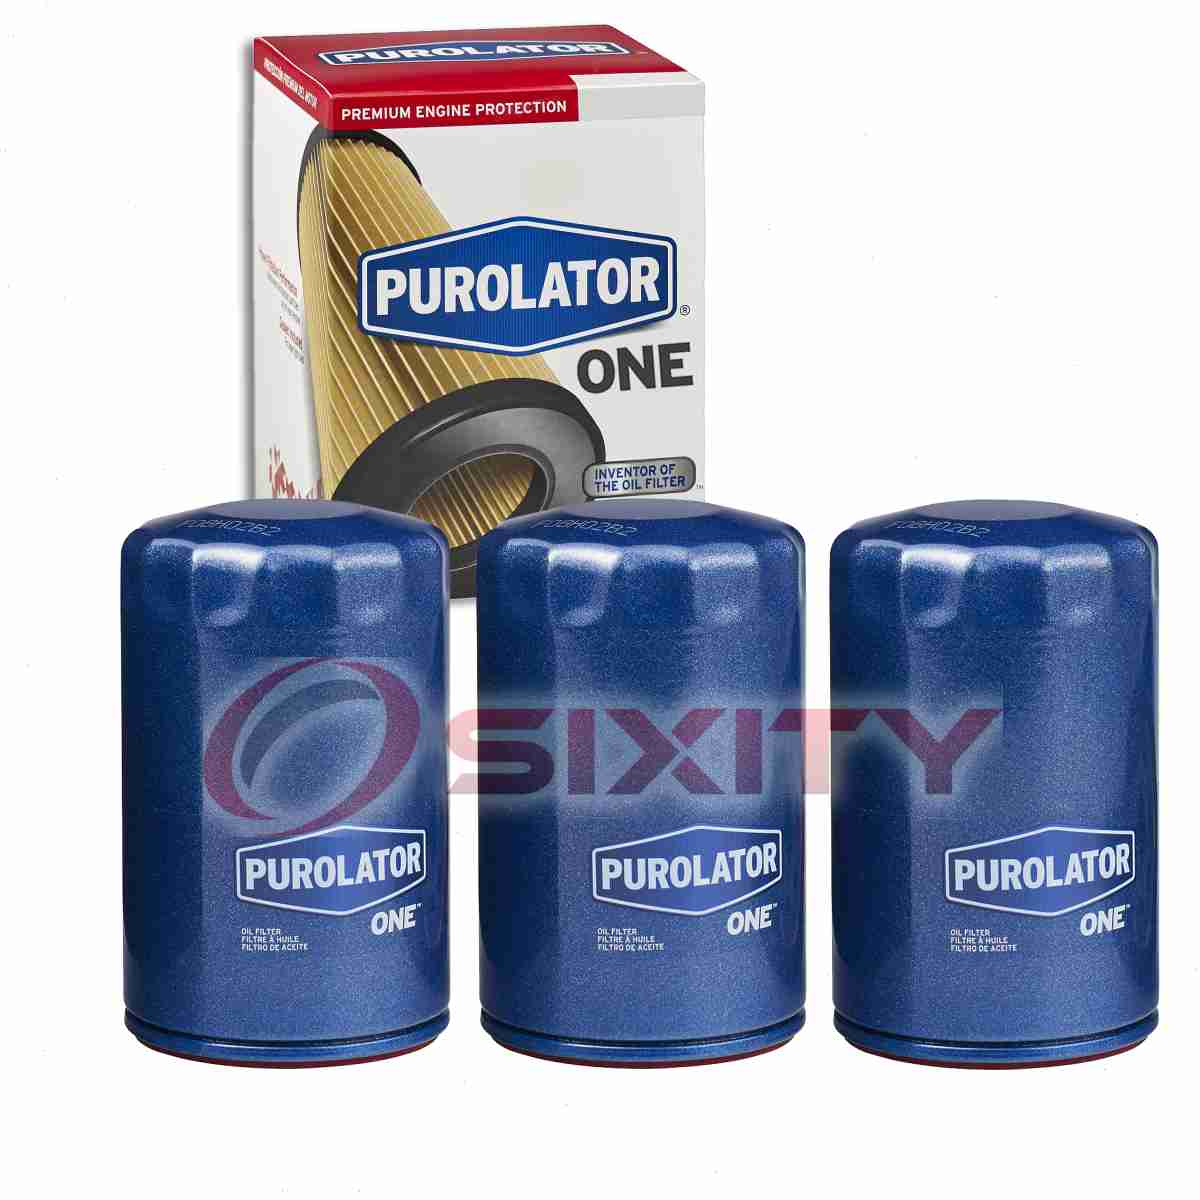 Long Life wj Purolator ONE Engine Oil Filter for 1996-1998 BMW Z3